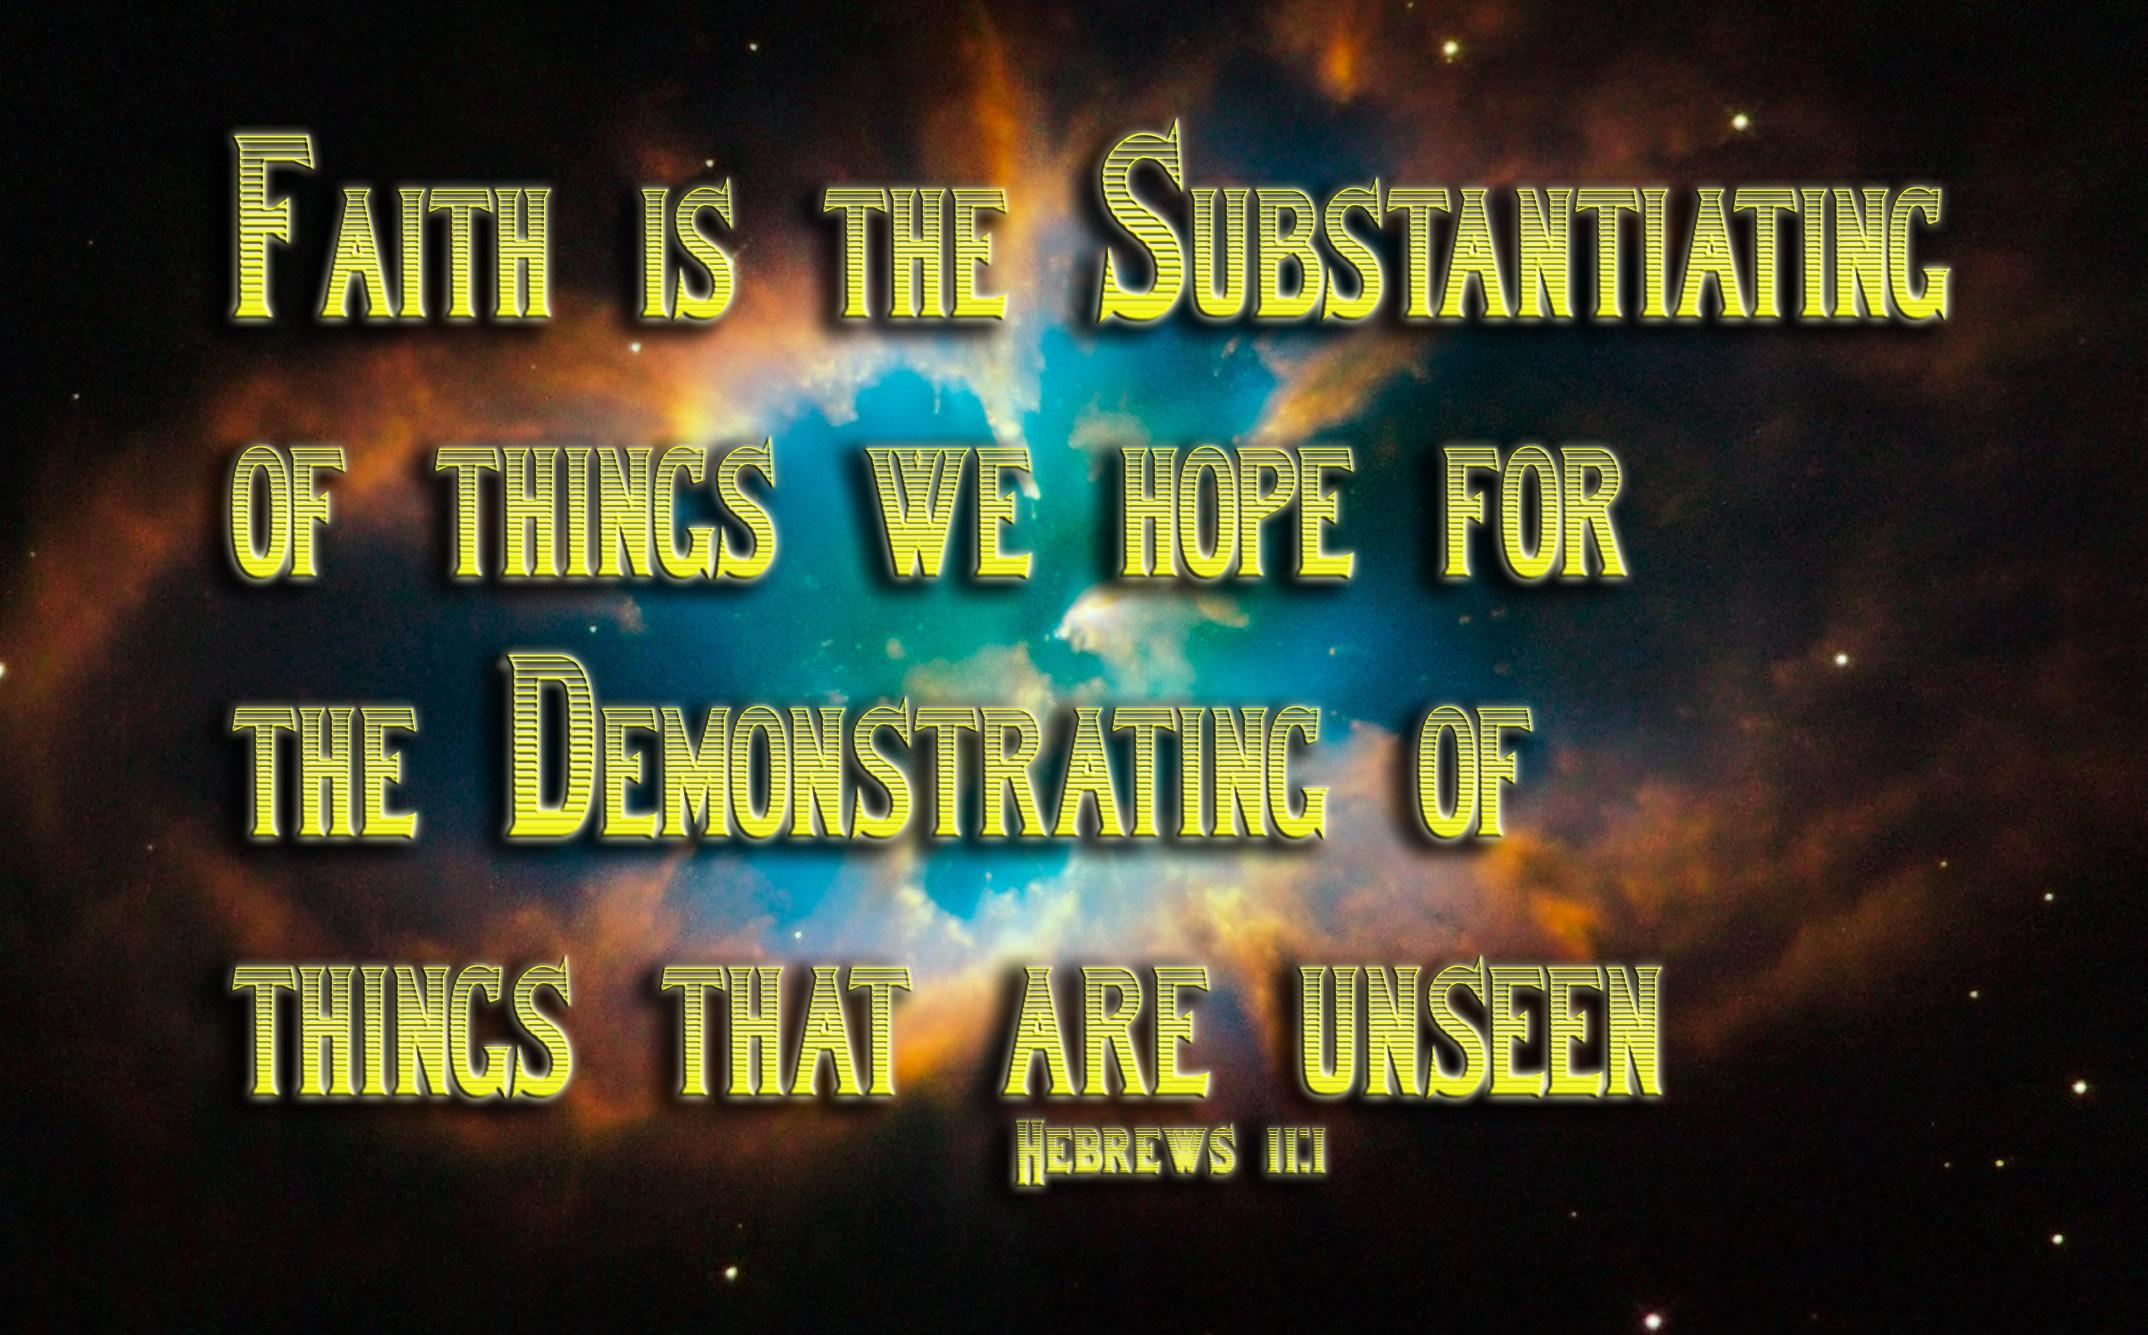 http://mudpreacher.files.wordpress.com/2013/03/hebrews-11_1-faith-jims-definition.jpg